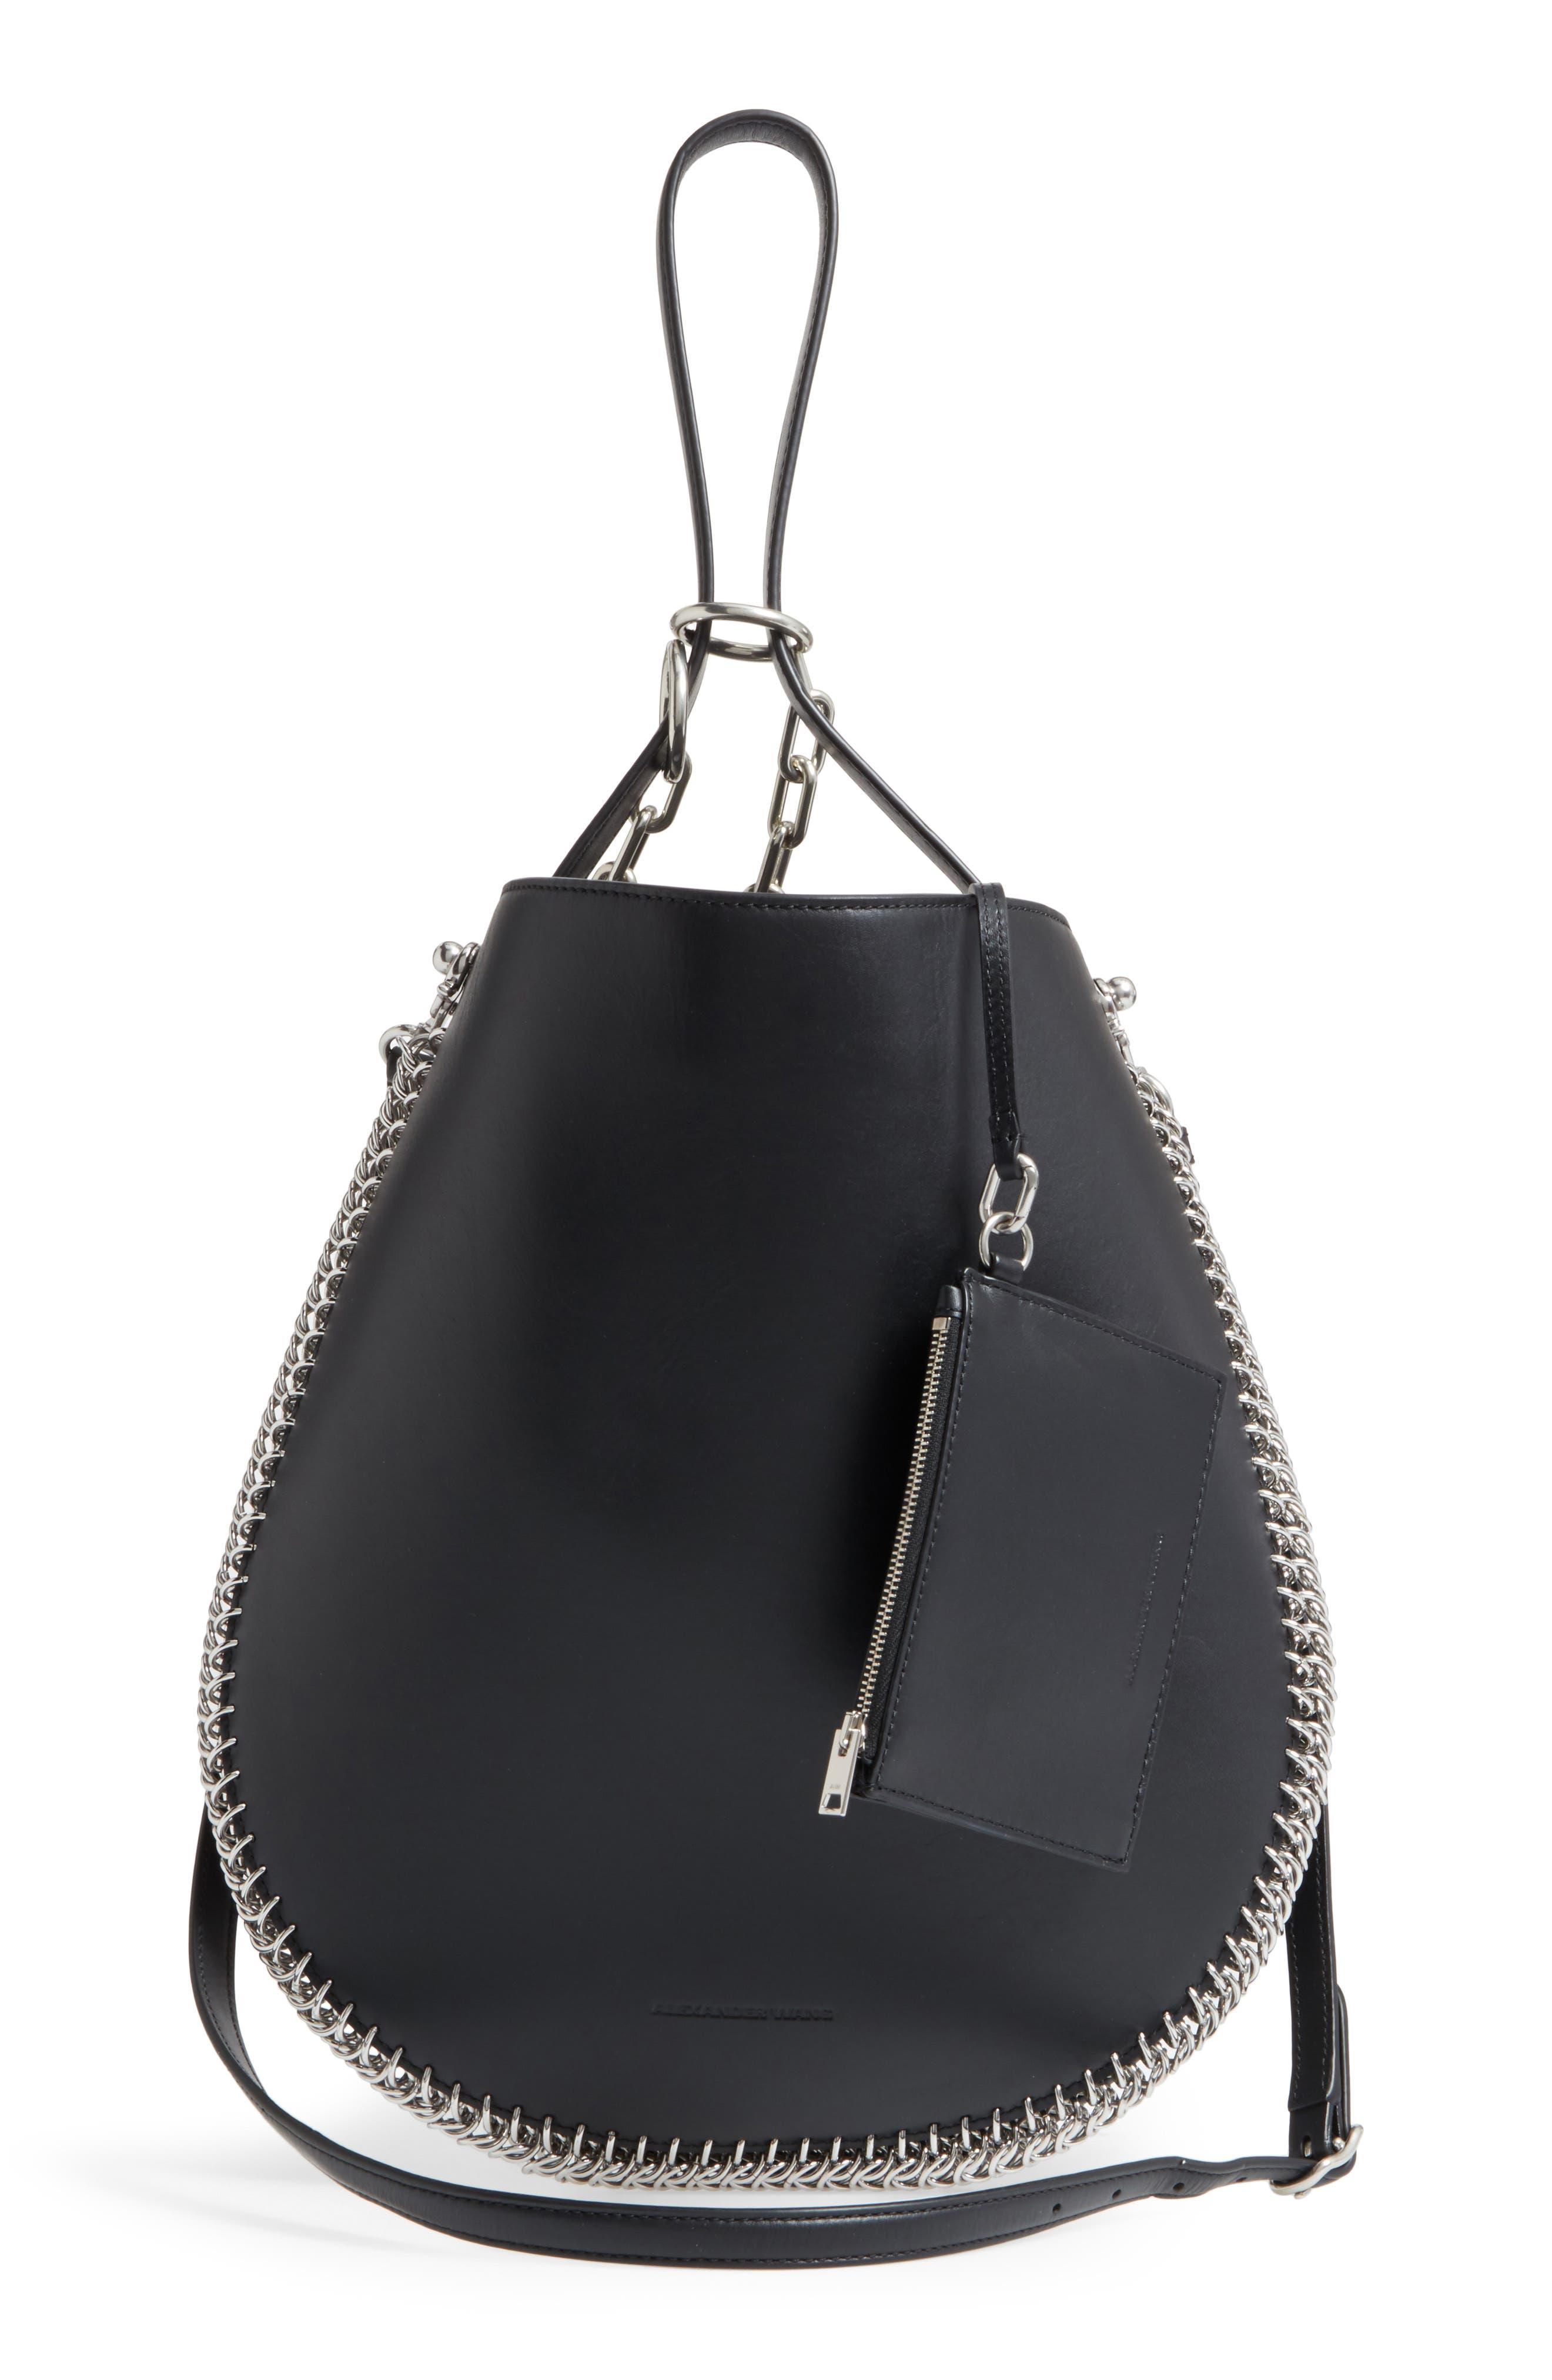 Roxy Studded Leather Hobo Bag,                             Alternate thumbnail 3, color,                             001